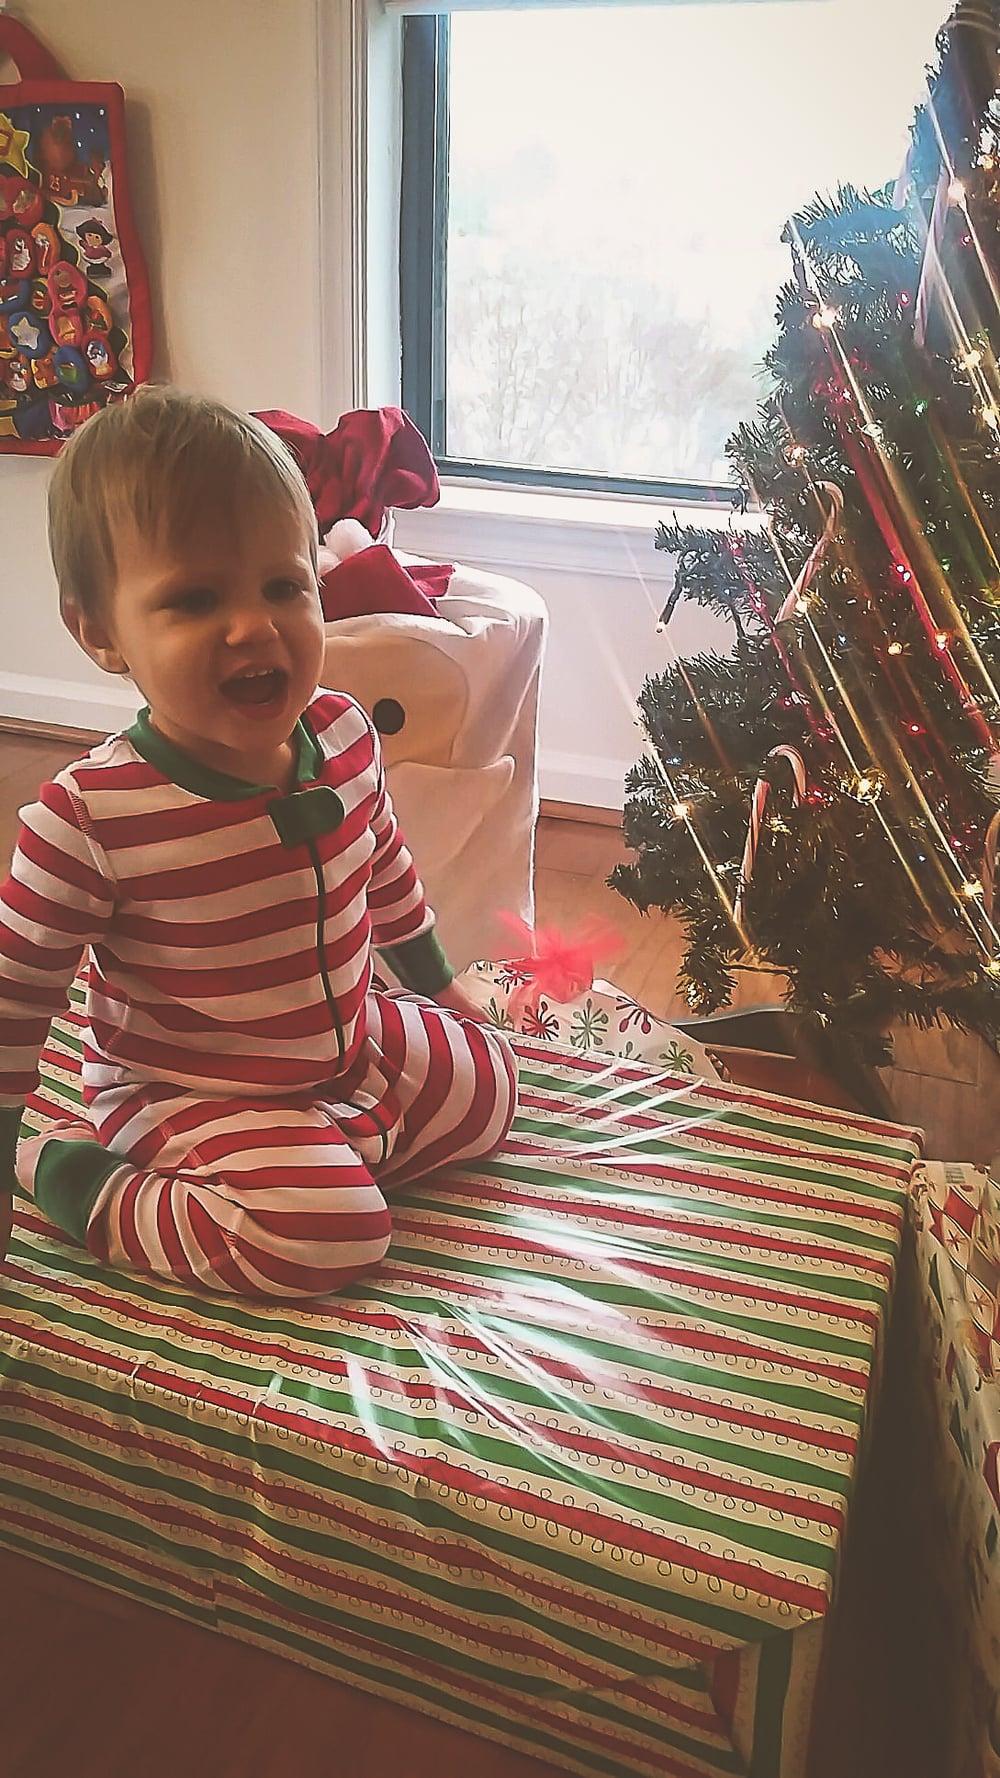 christmasmorningexcitement.jpg